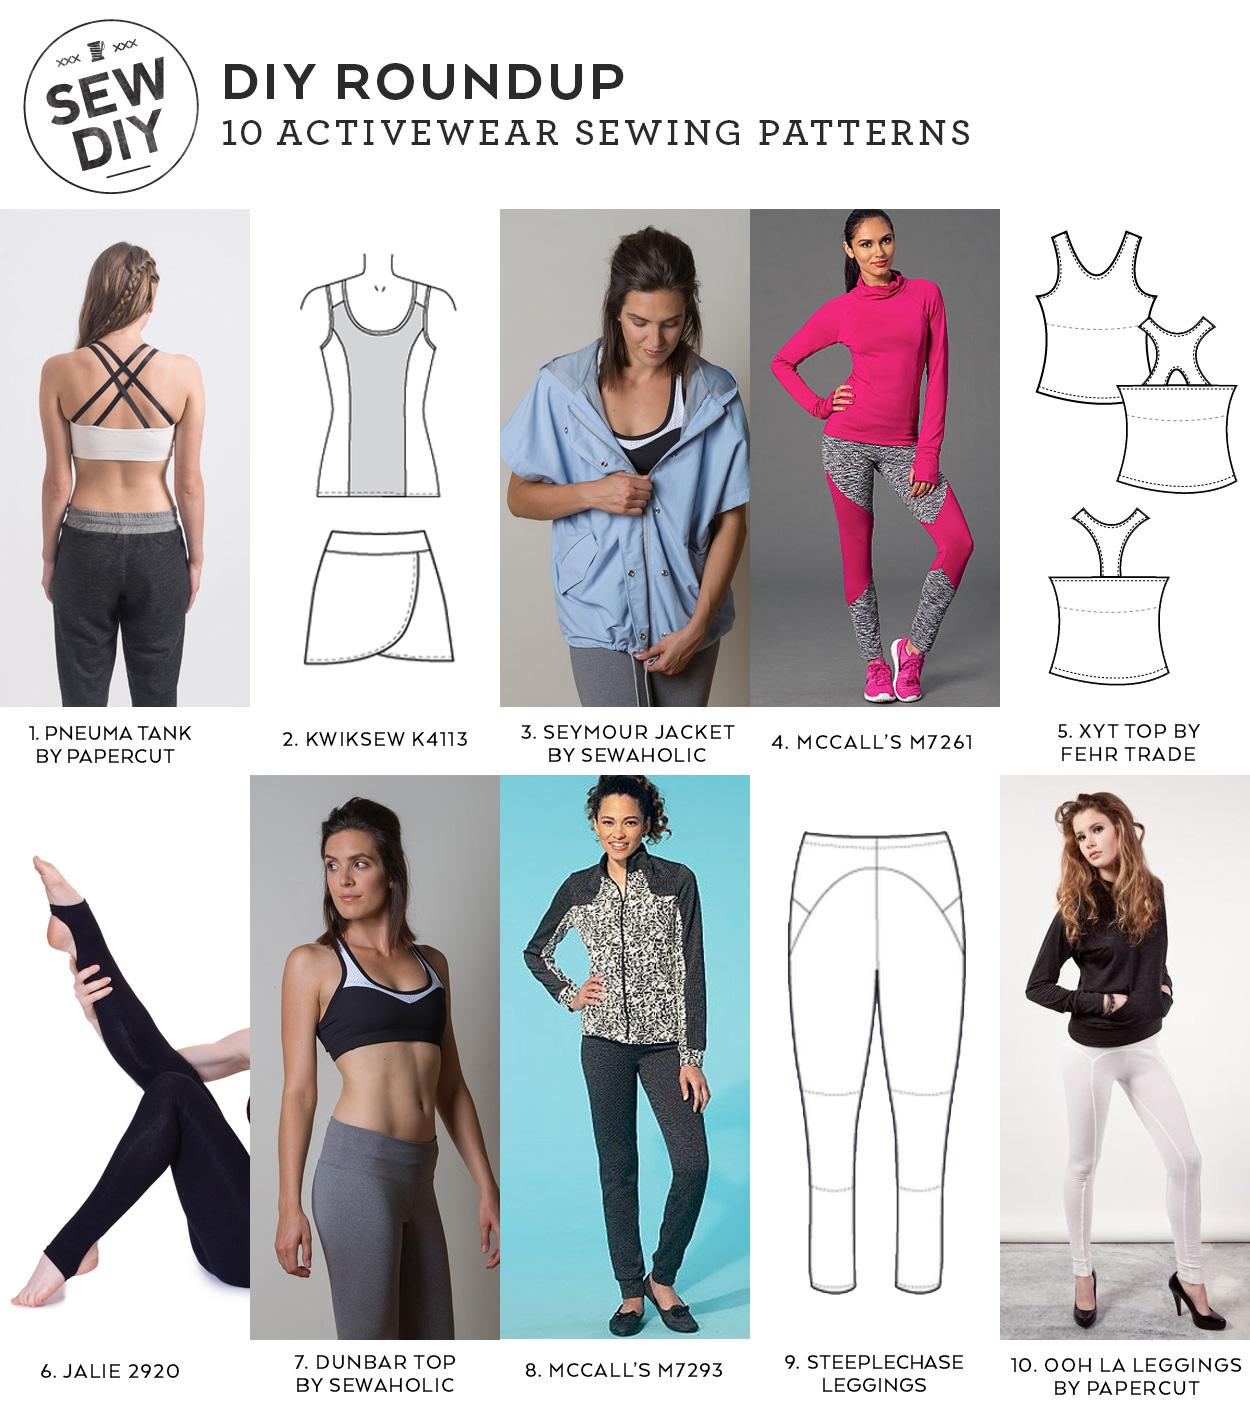 10 Activewear Sewing Patterns | Sew DIY